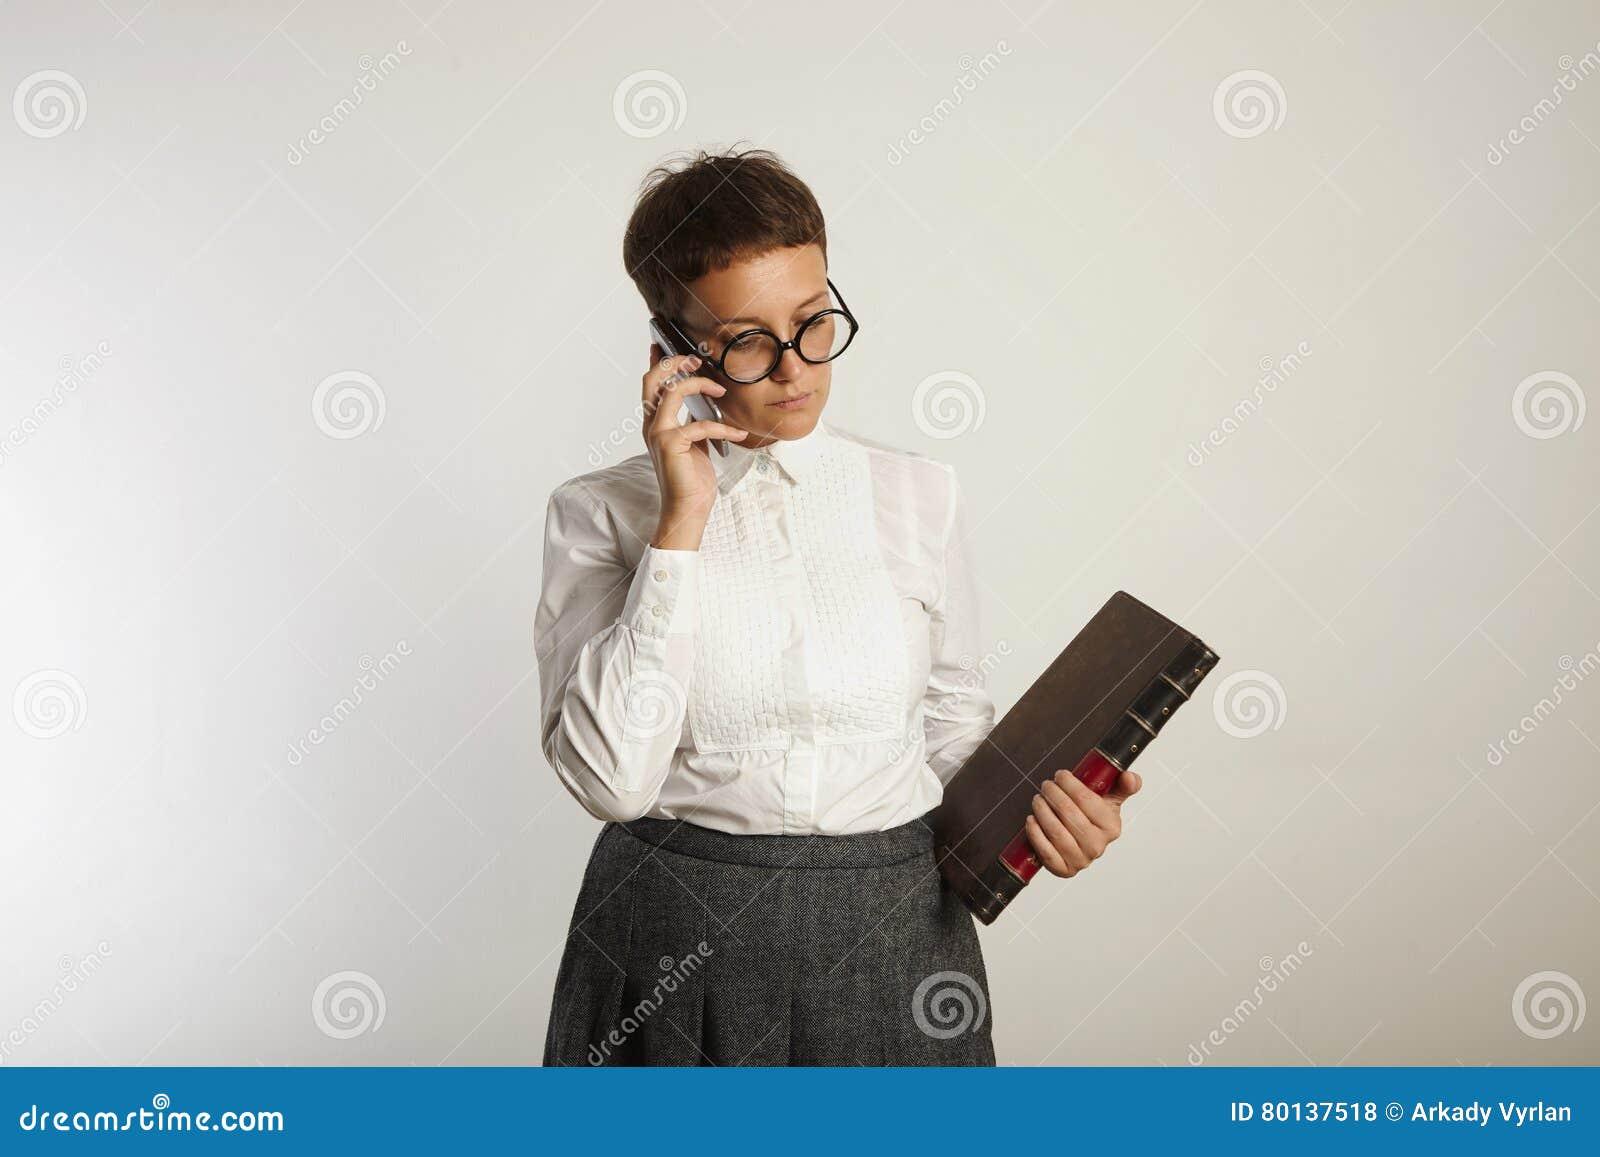 Funny Teacher Speaking On Mobile Phone Stock Photo - Image ...